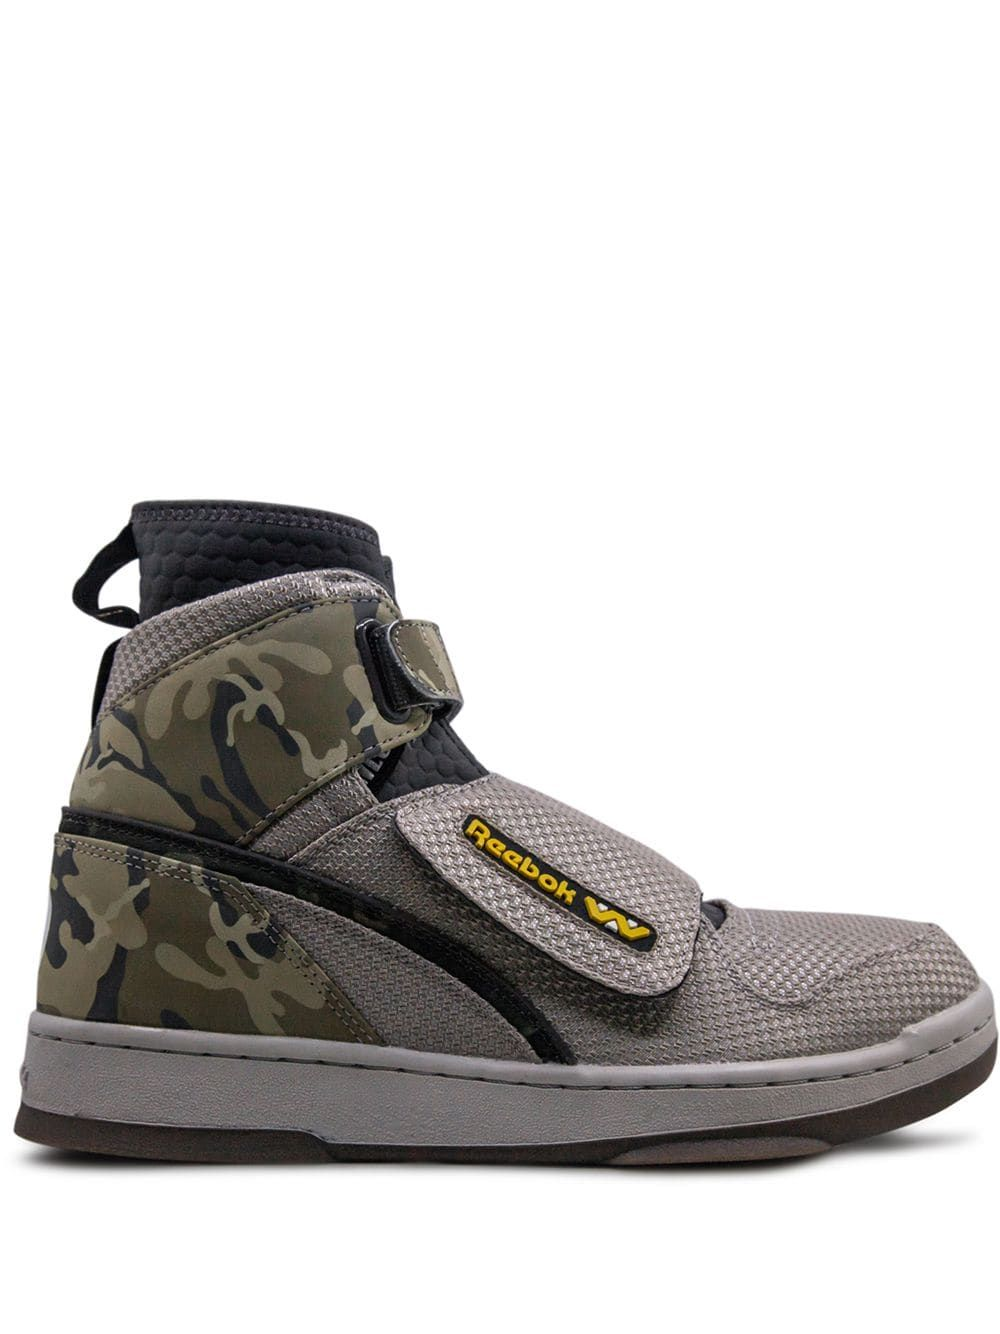 Reebok Alien Storm Bug Stomper Sneakers Farfetch Reebok Alien Sneakers Reebok